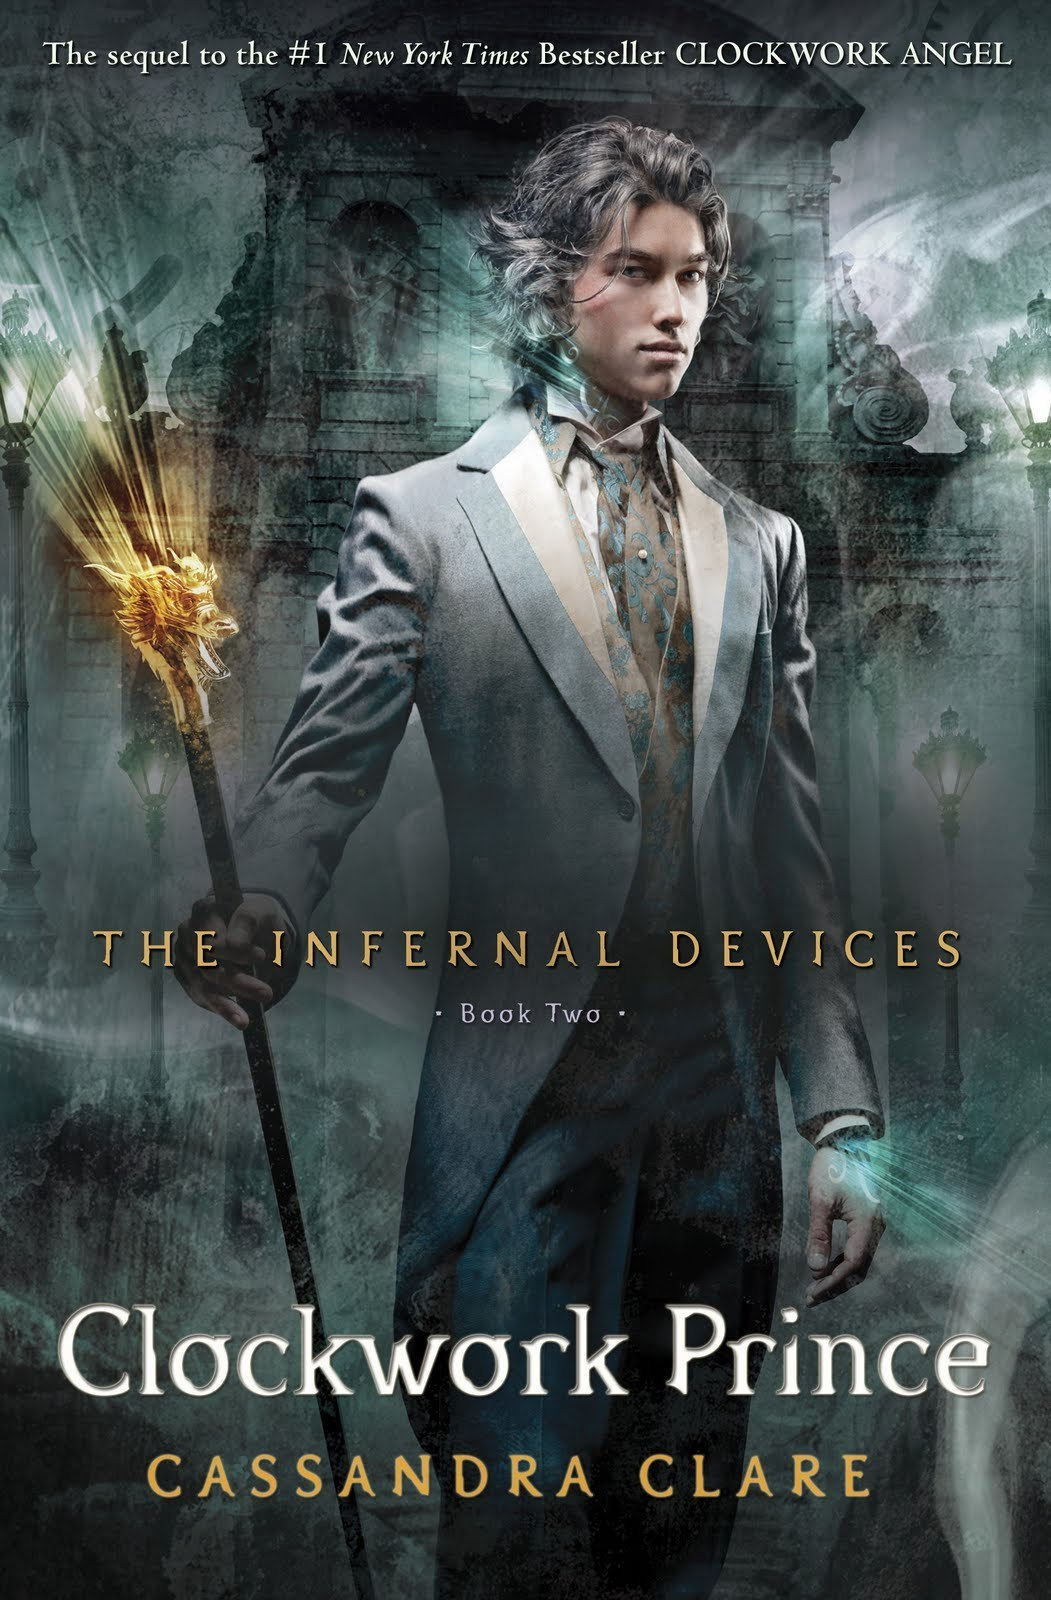 The Infernal Devices: Clockwork Prince Bk. 2 by Cassandra Clare (2015, Paperback